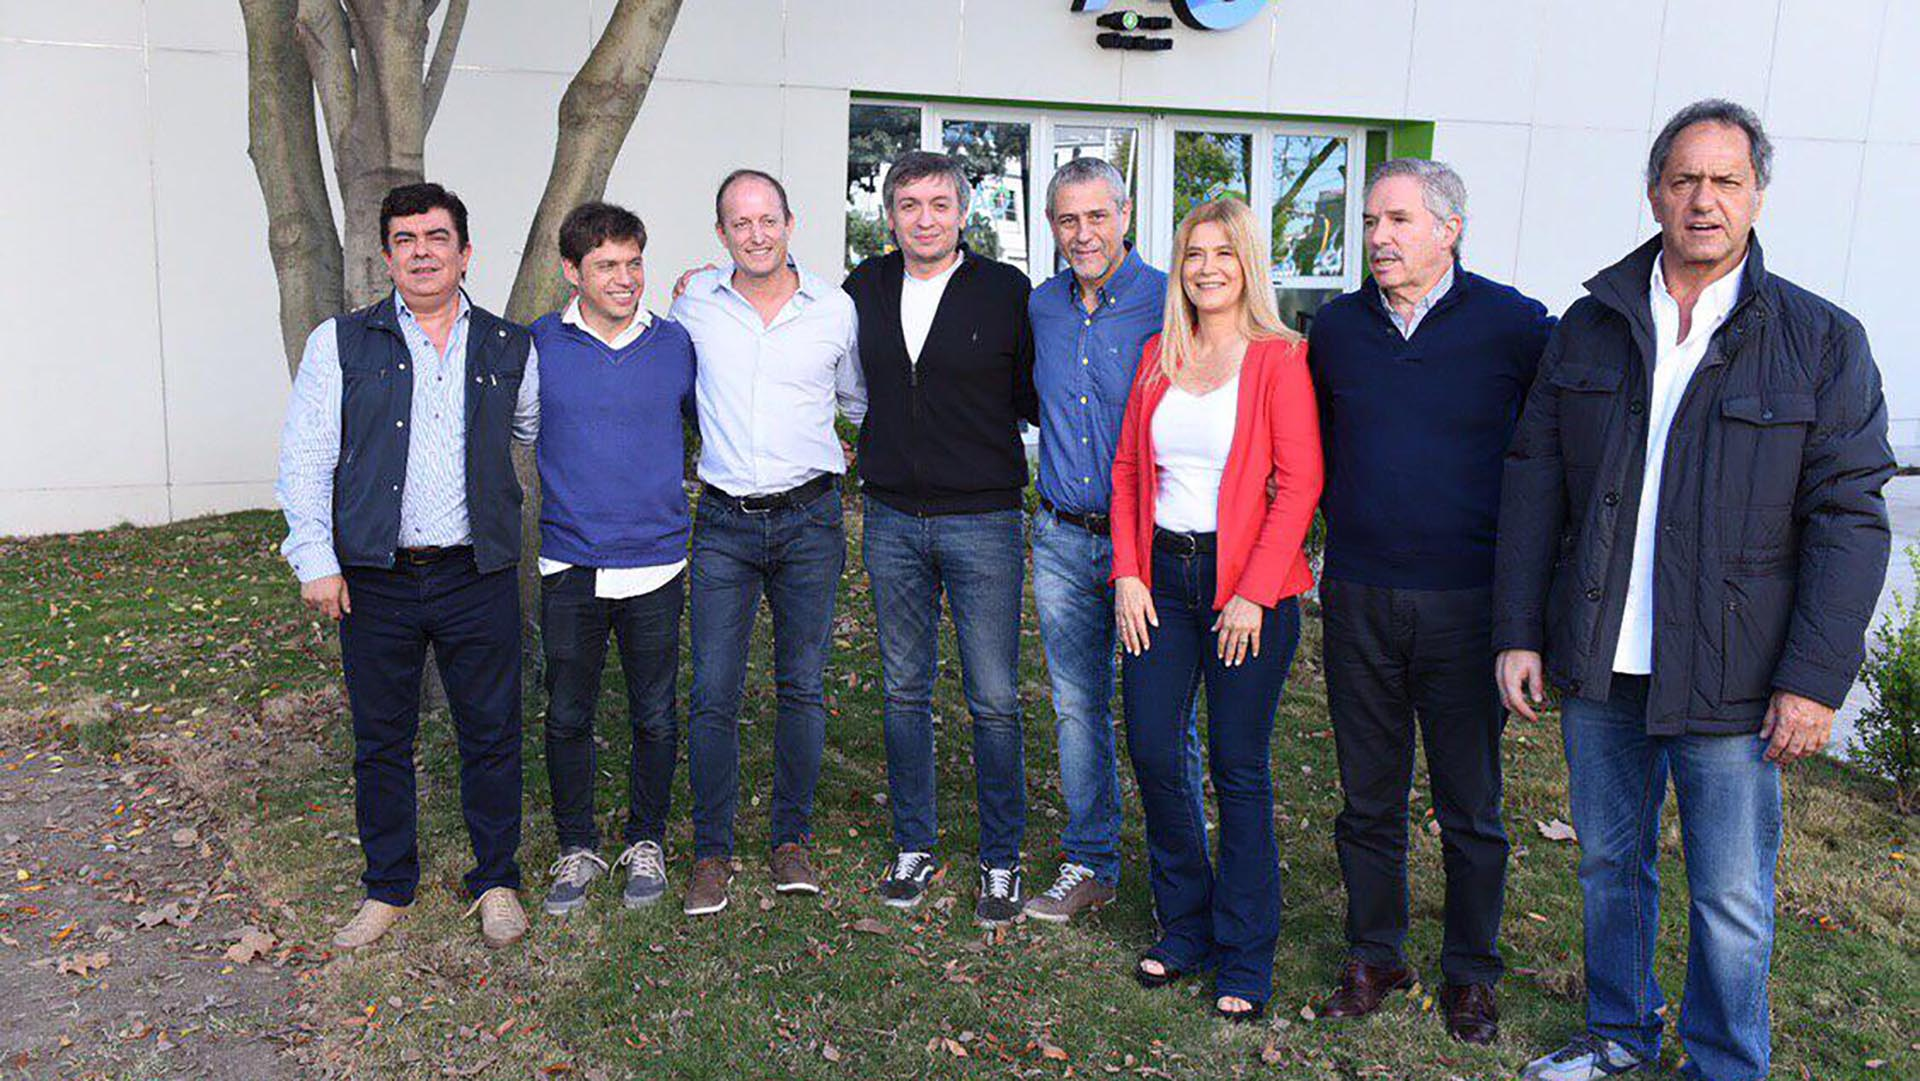 Fernando Espinoza, Axel Kicillof, Martín Insaurralde, Máximo Kirchner, Ferraresi, Verónica Magario, Felipe Solá y Scioli durante un acto en Avellaneda